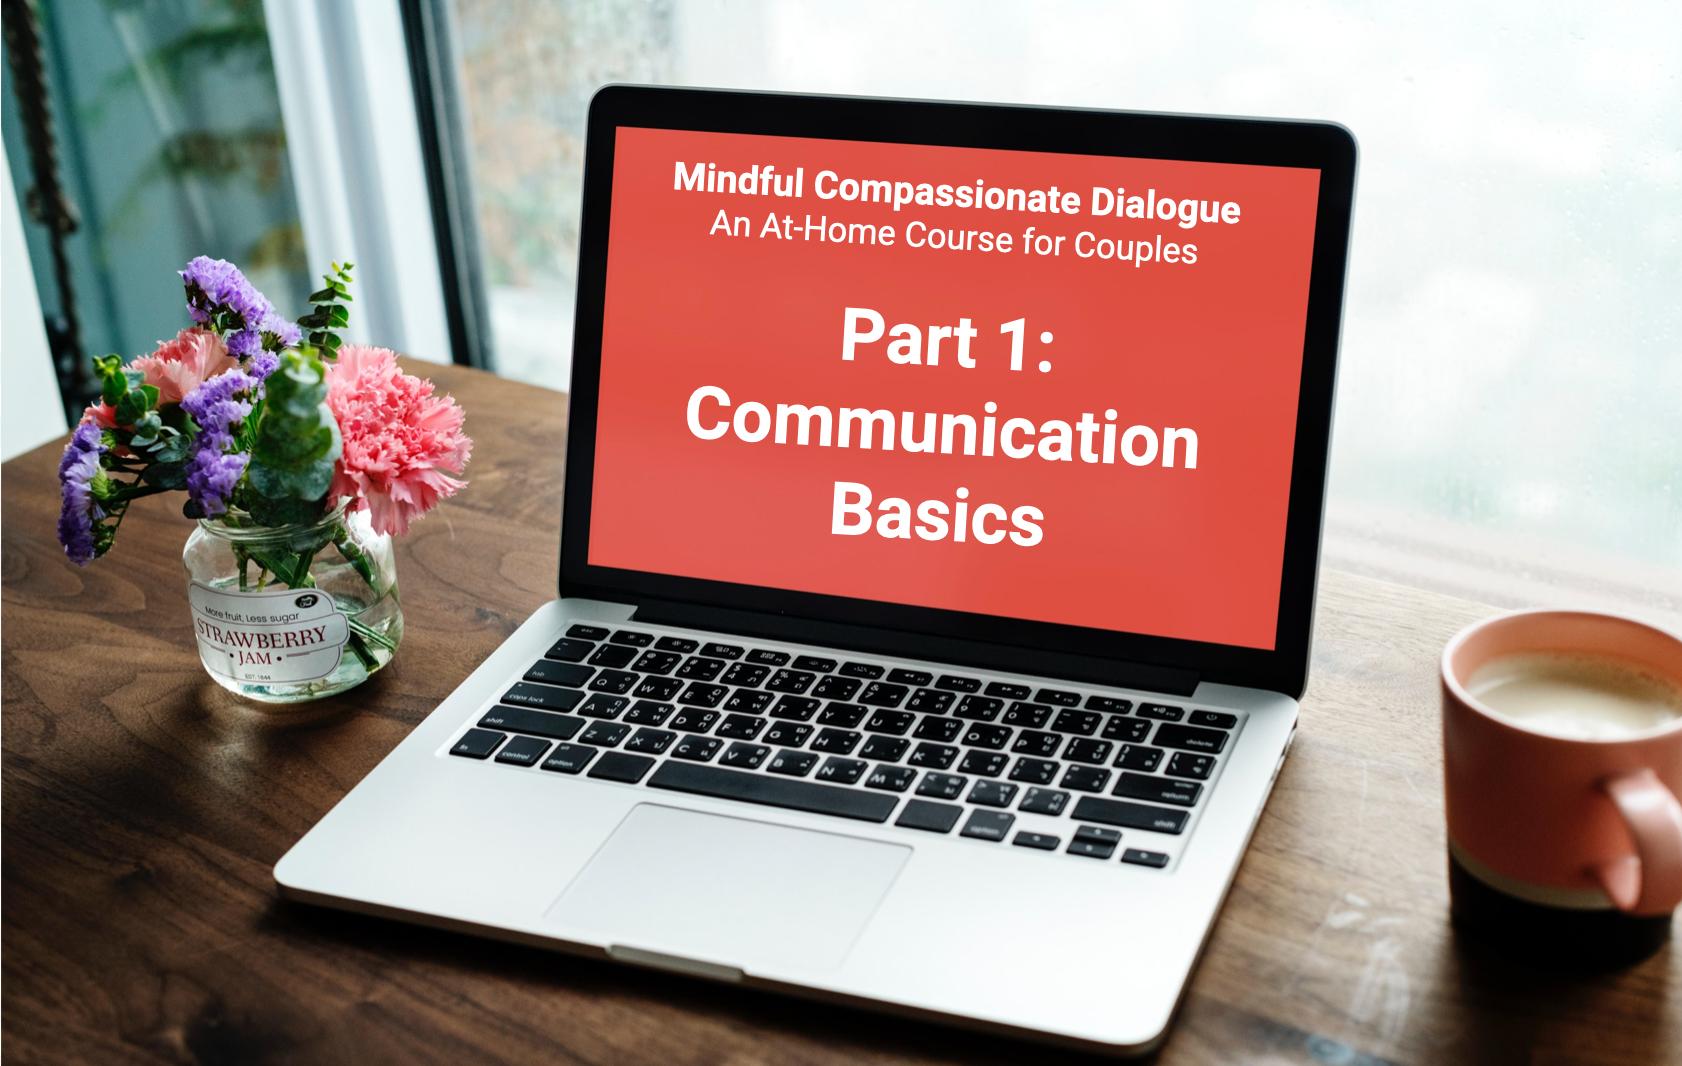 Part 1: Communication Basics for Couples